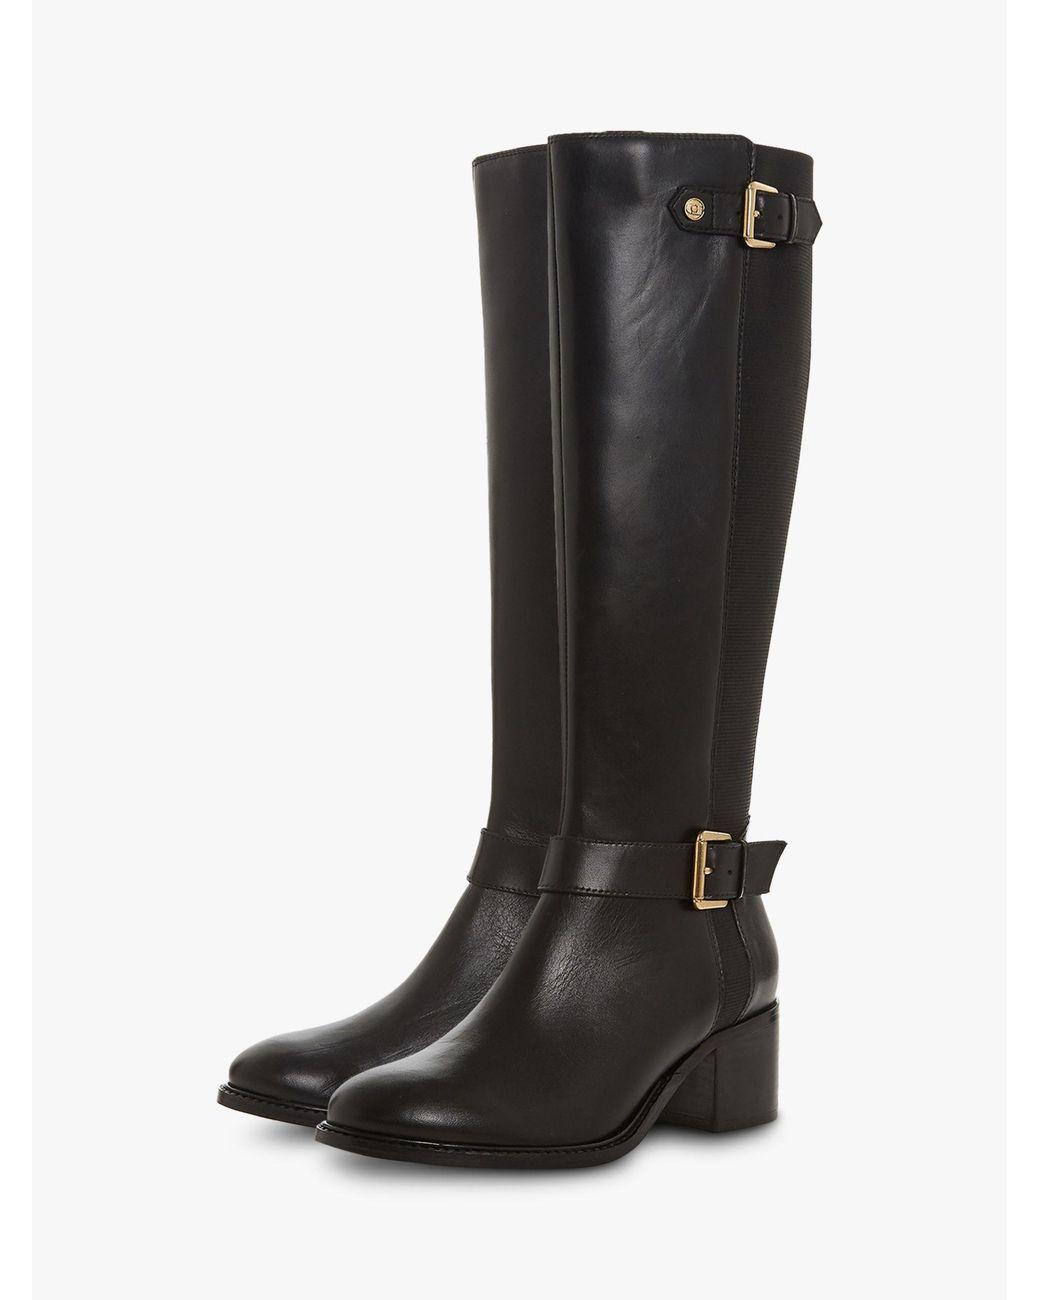 Dune Leather Tildaa Knee High Boots in